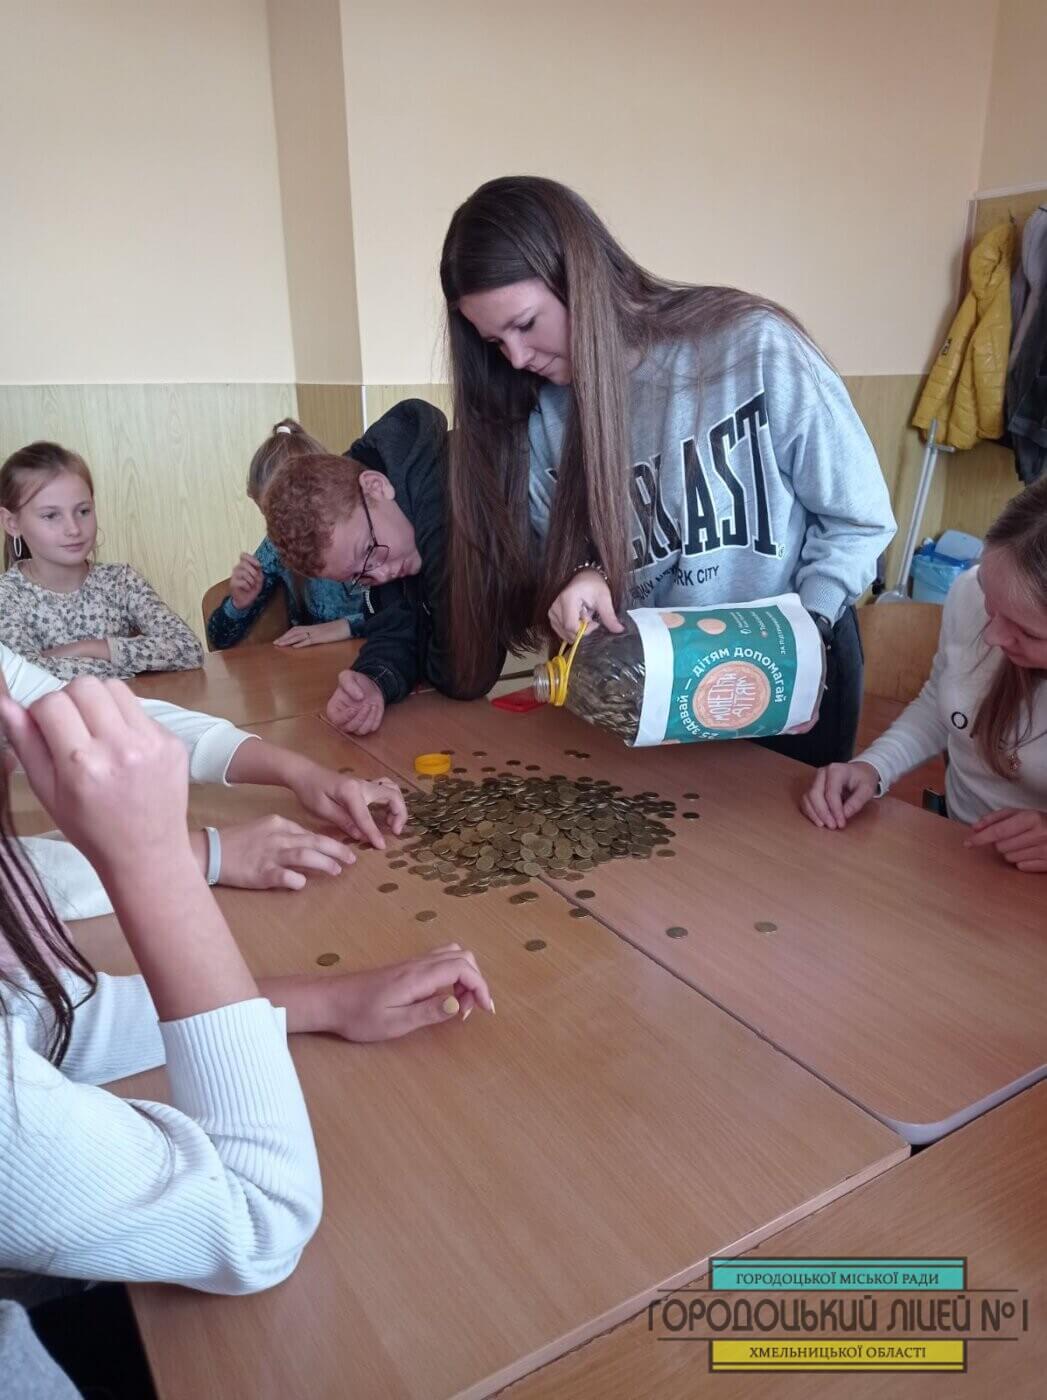 zobrazhennya viber 2021 09 30 16 40 26 616 1047x1400 - «Монетки дітям»